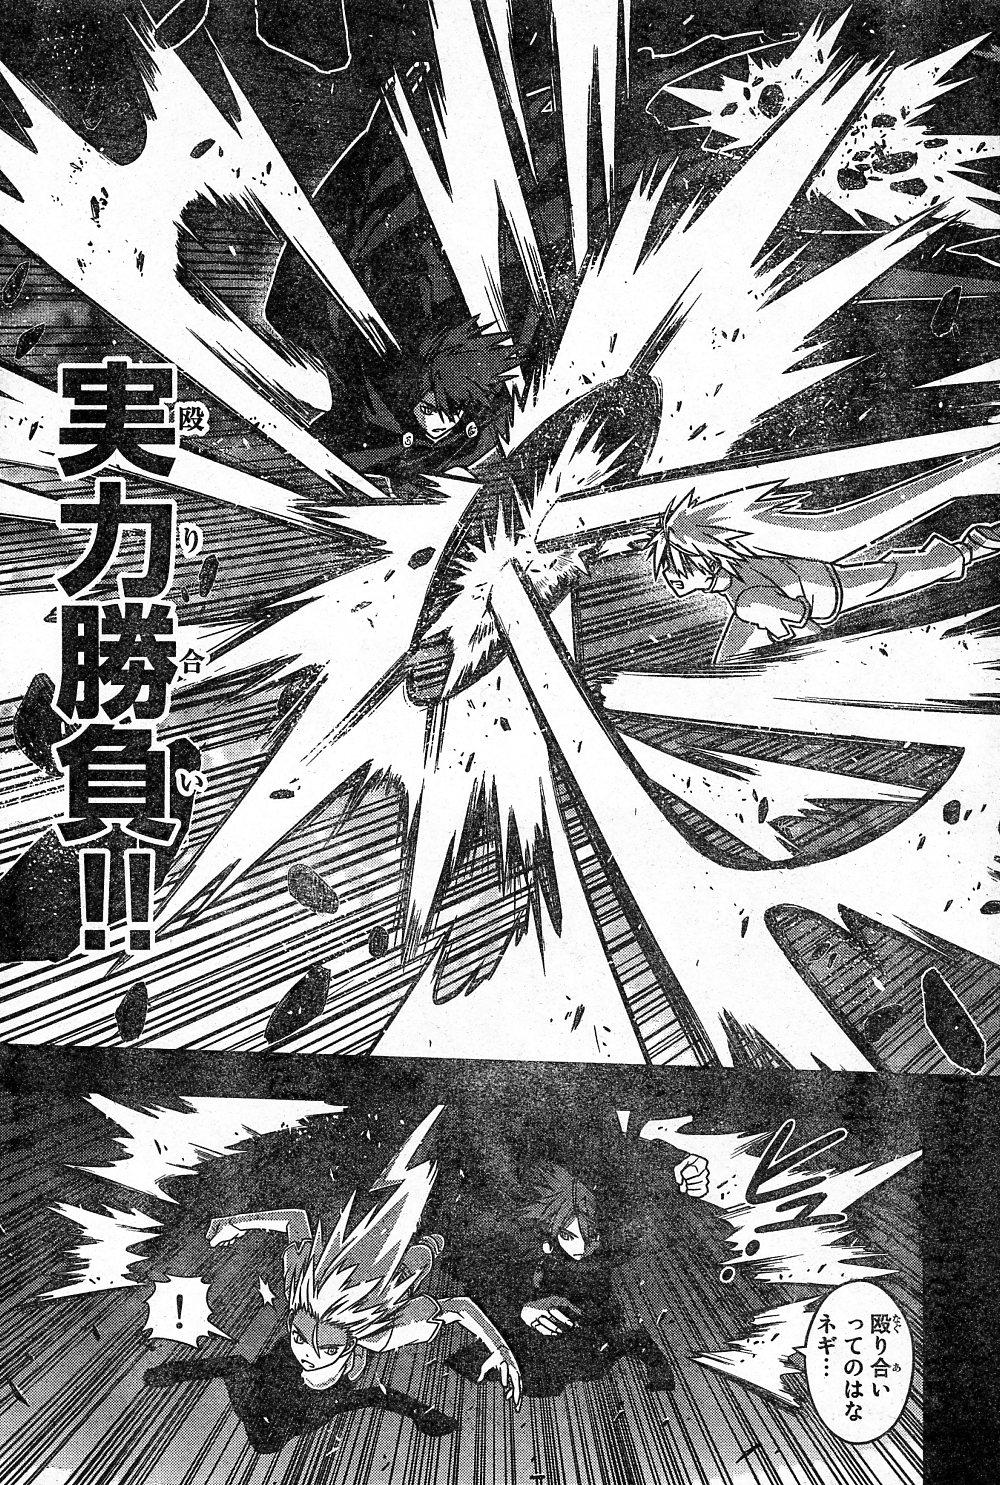 uq holder chapter 139 spoiler images  u0026 anime teaser trailer  to tide us until the english